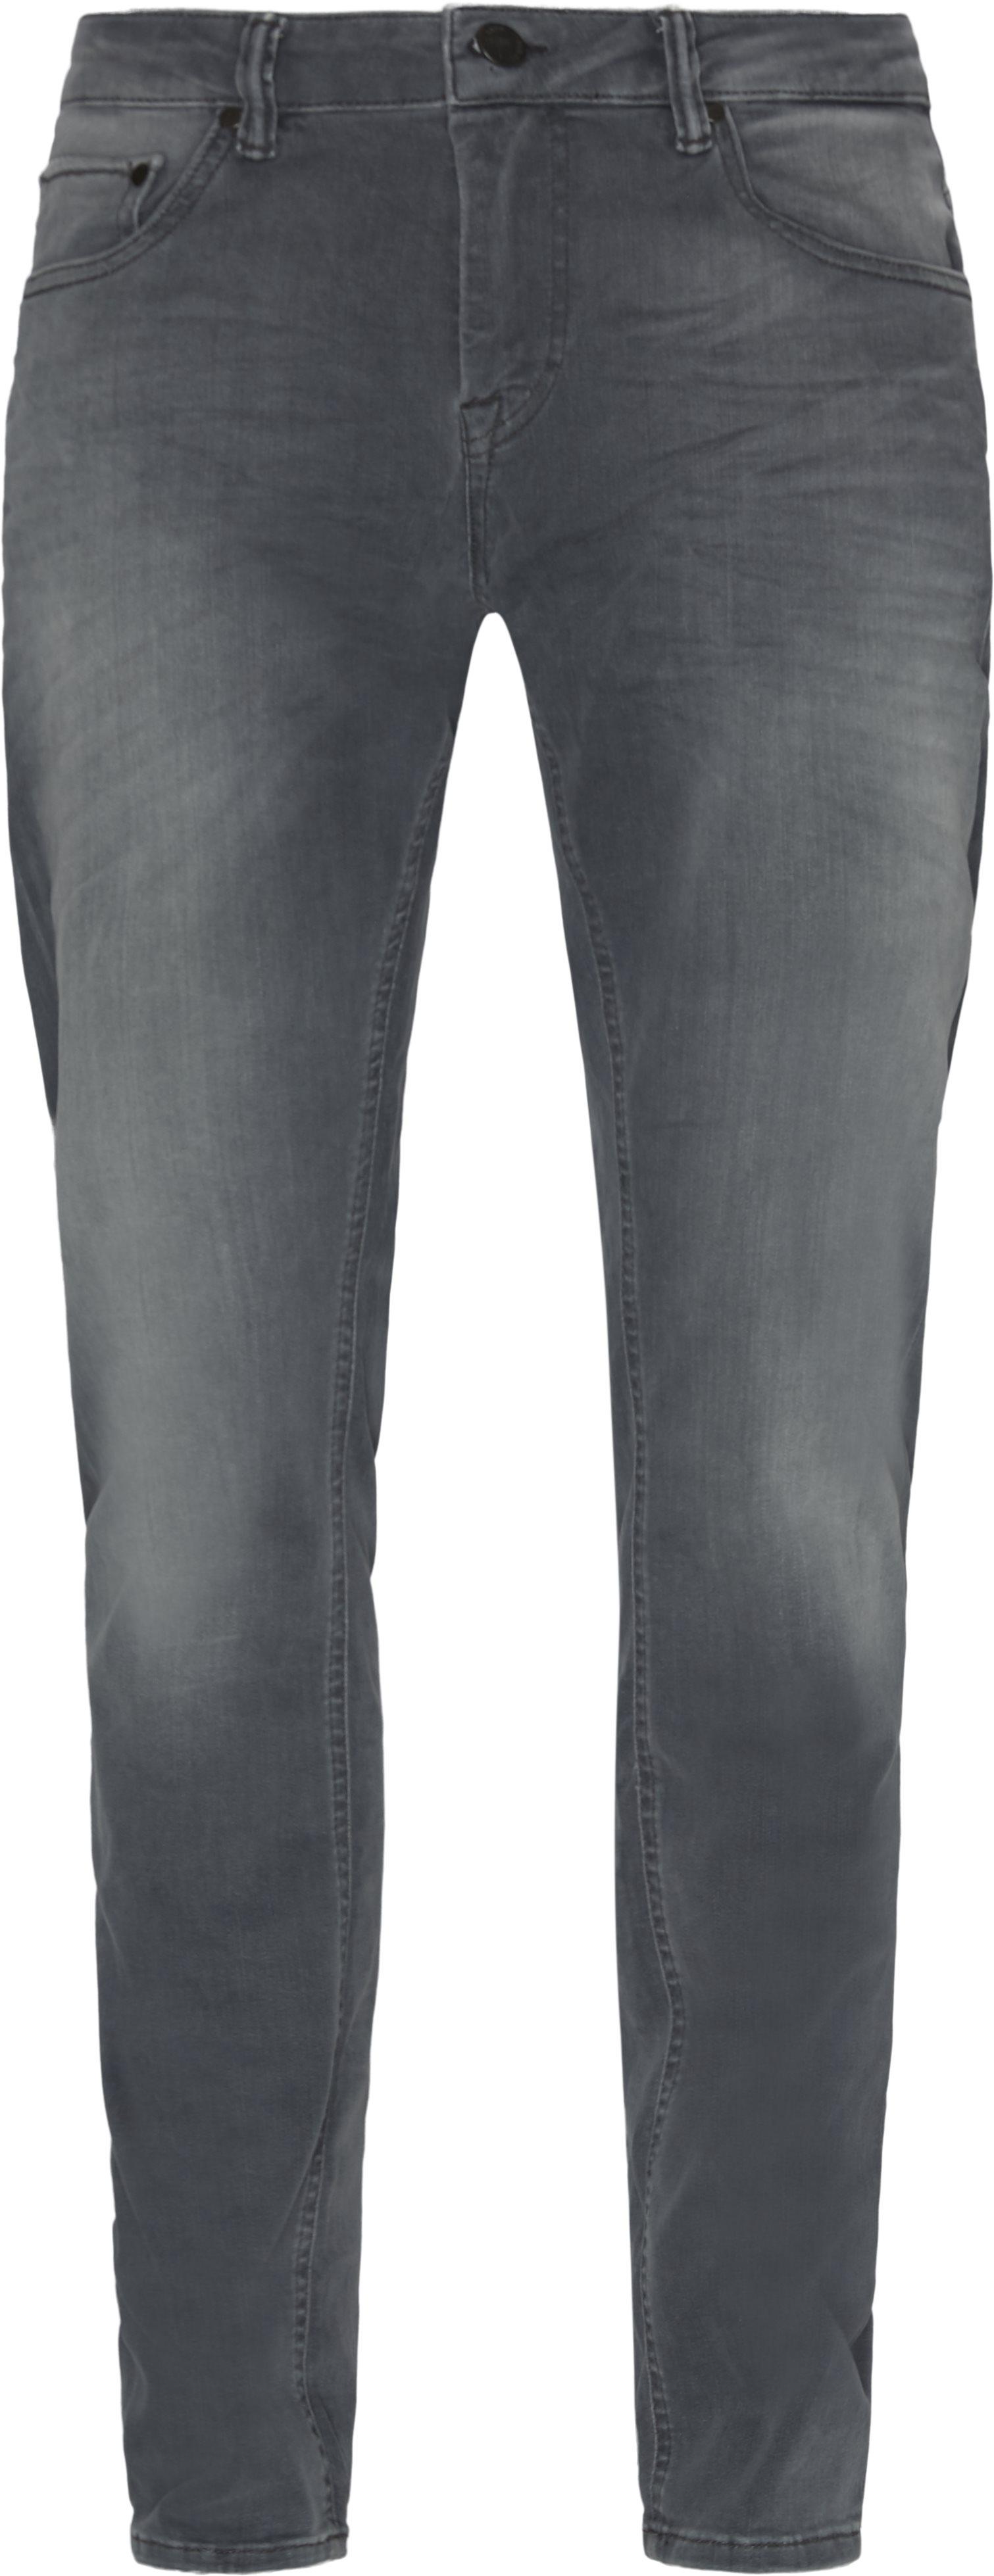 Jones Jeans - Jeans - Tapered fit - Grå